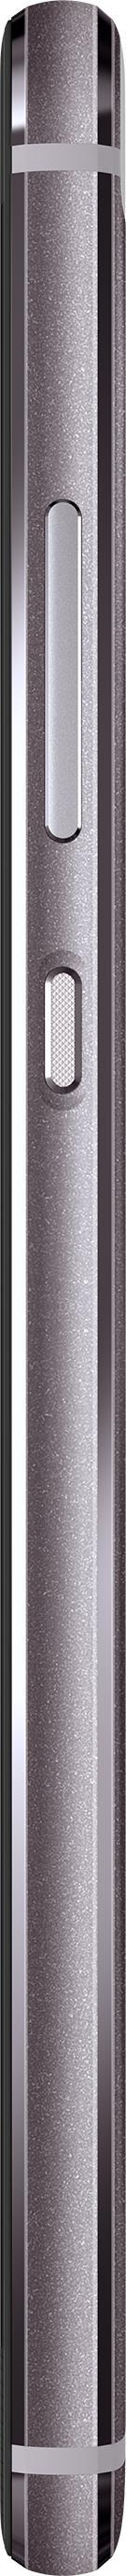 Huawei P9 Titanium Grey side high res